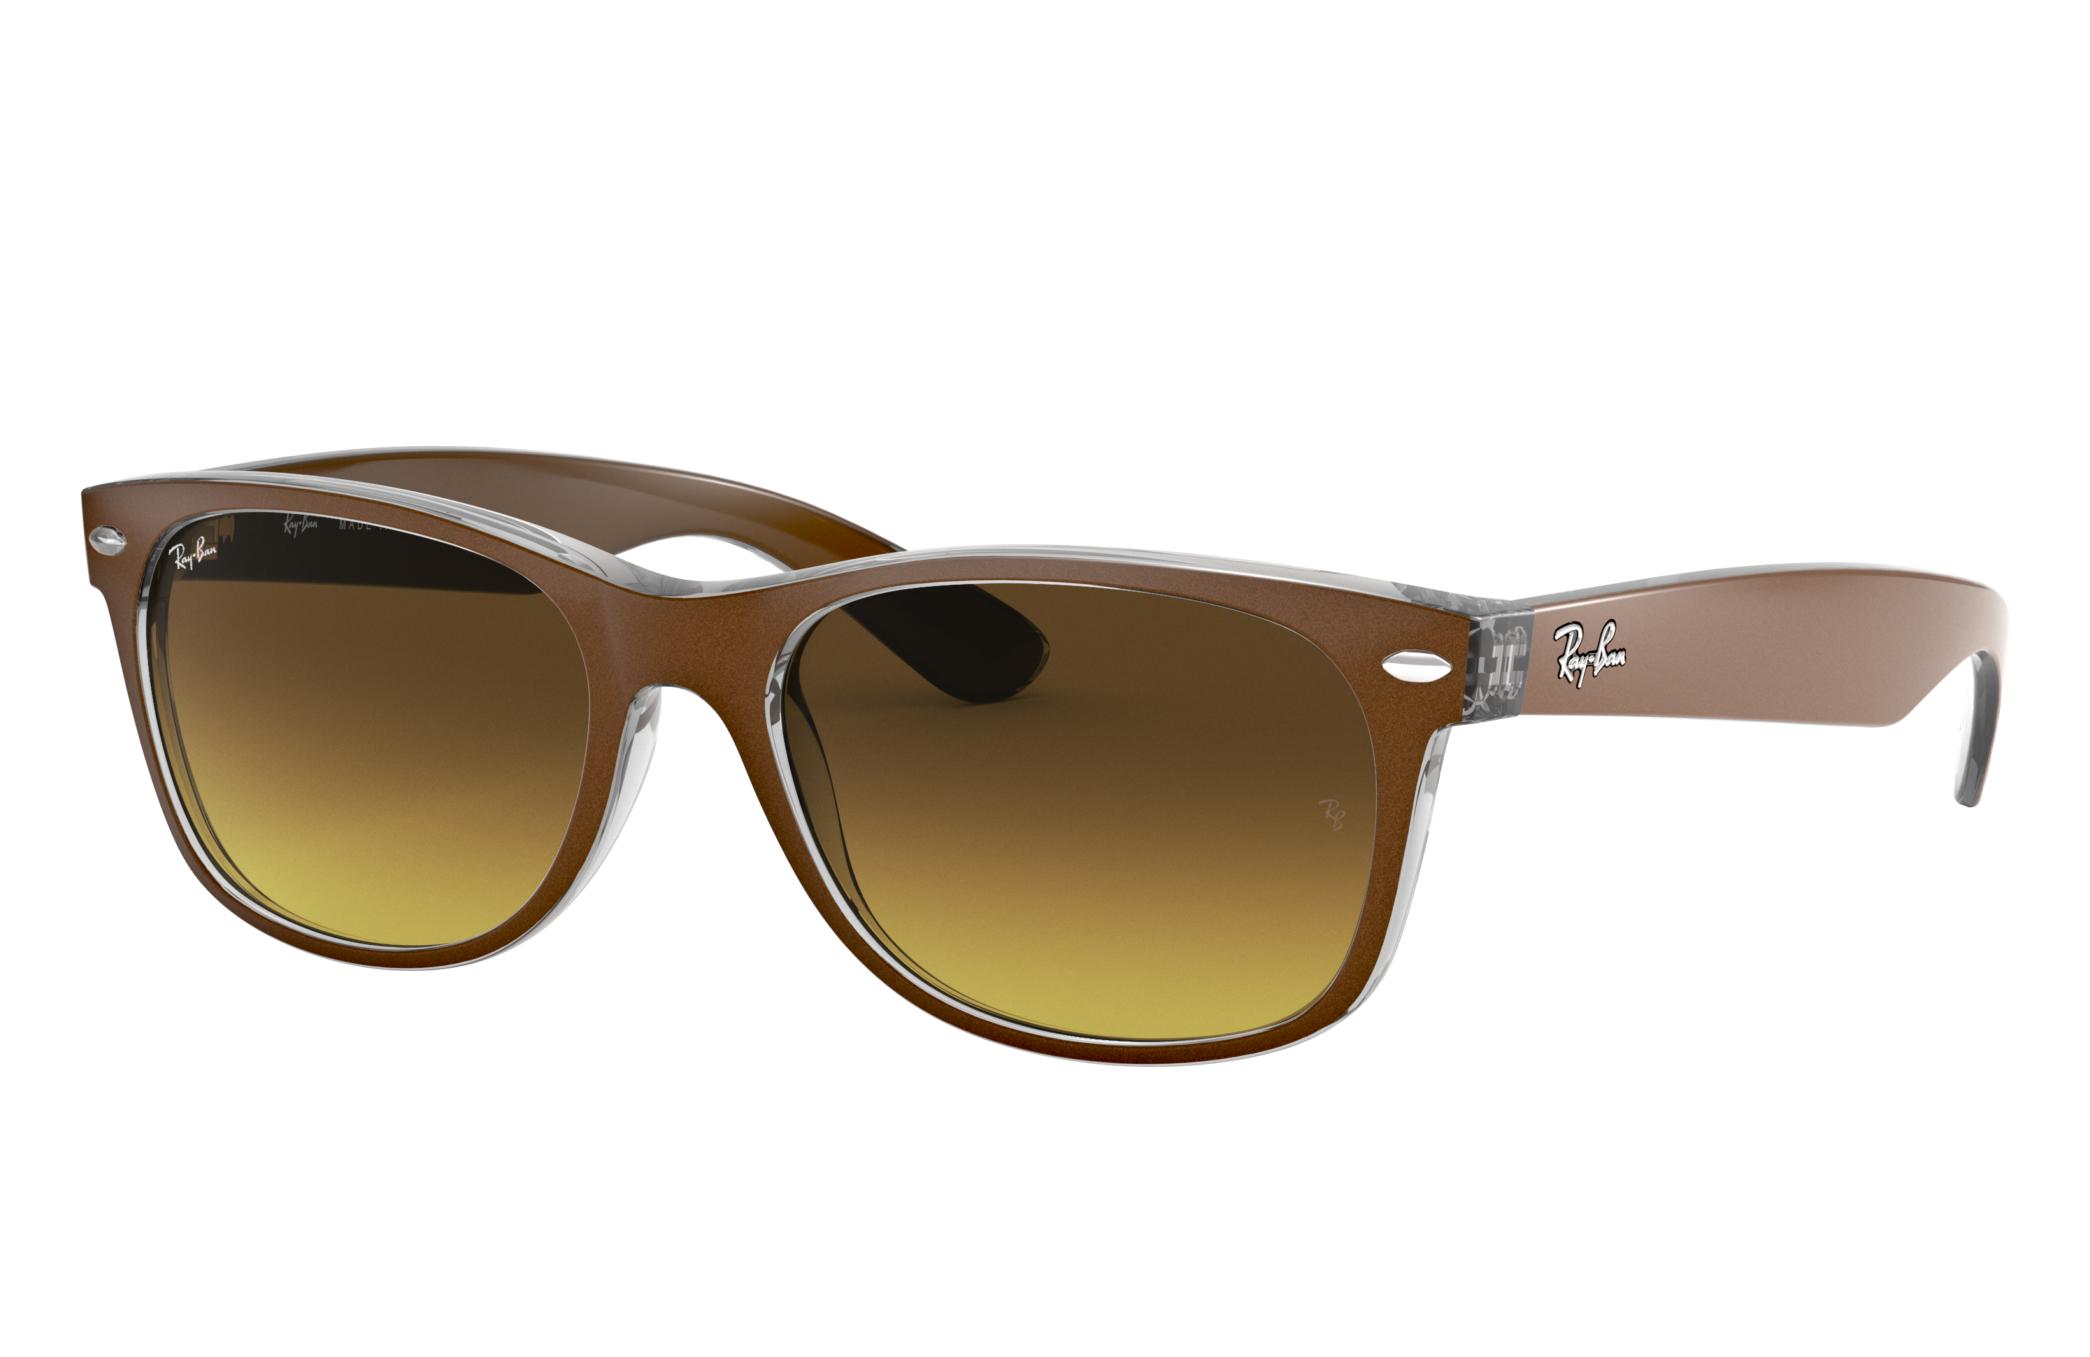 Ray-Ban New Wayfarer Color Mix Brown, Brown Lenses - RB2132